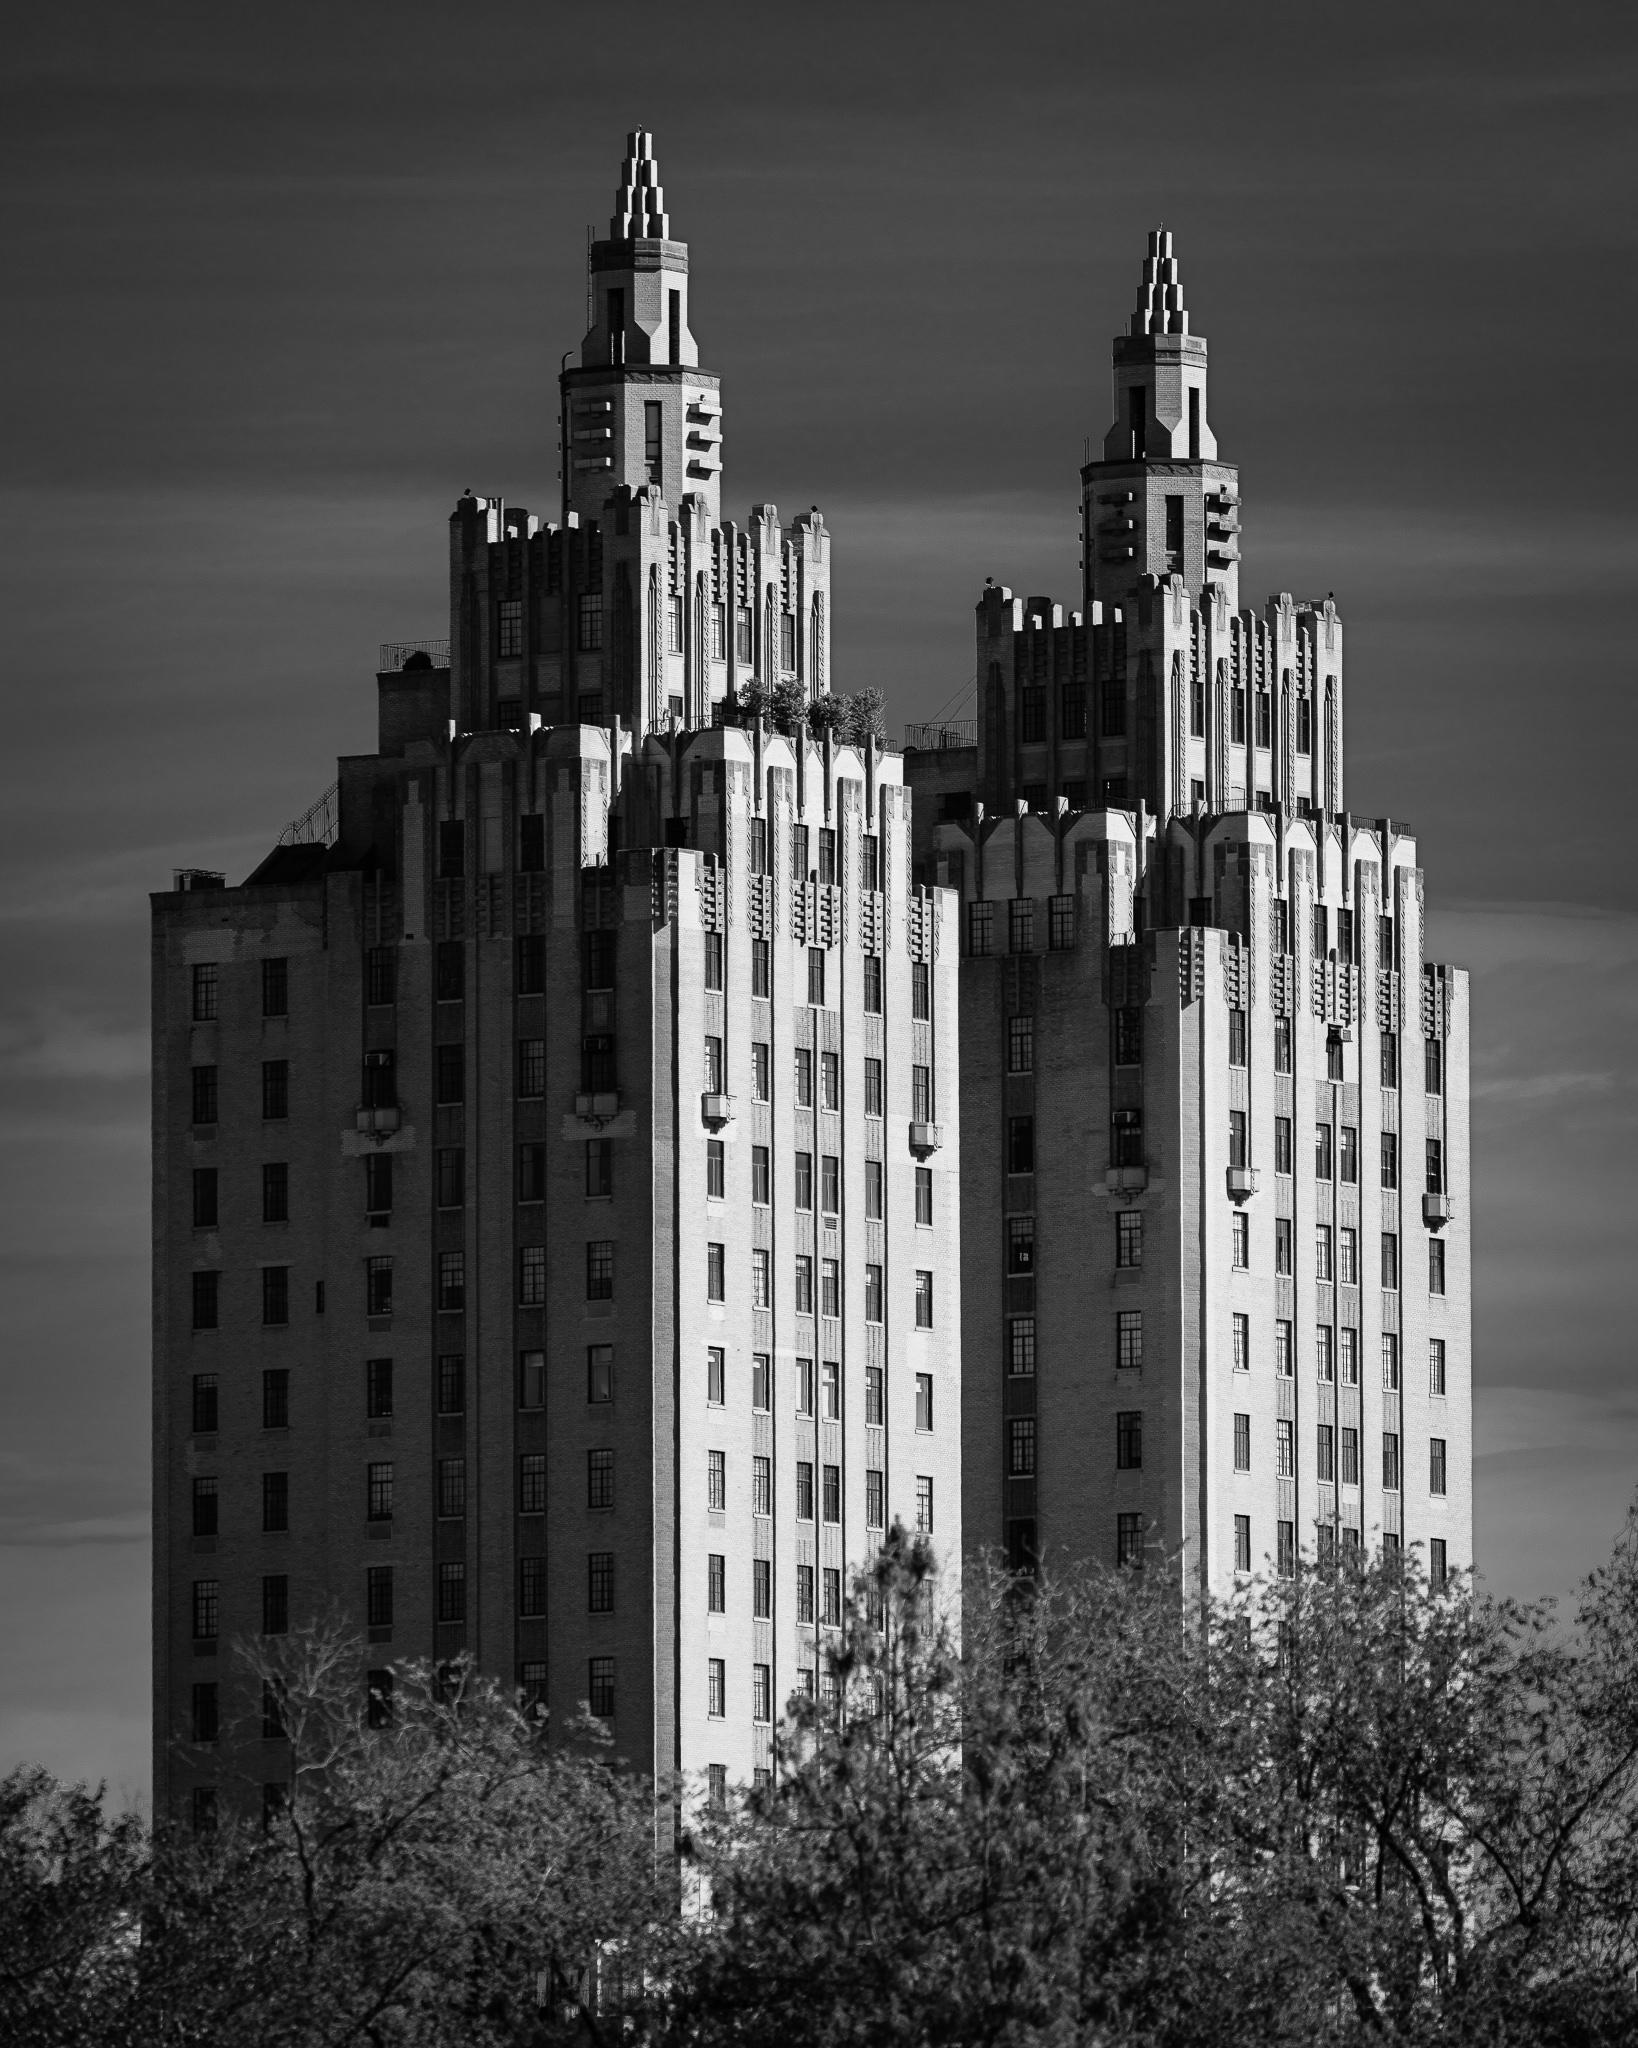 a black and white photograph of the eldorado apartment building central park west new york